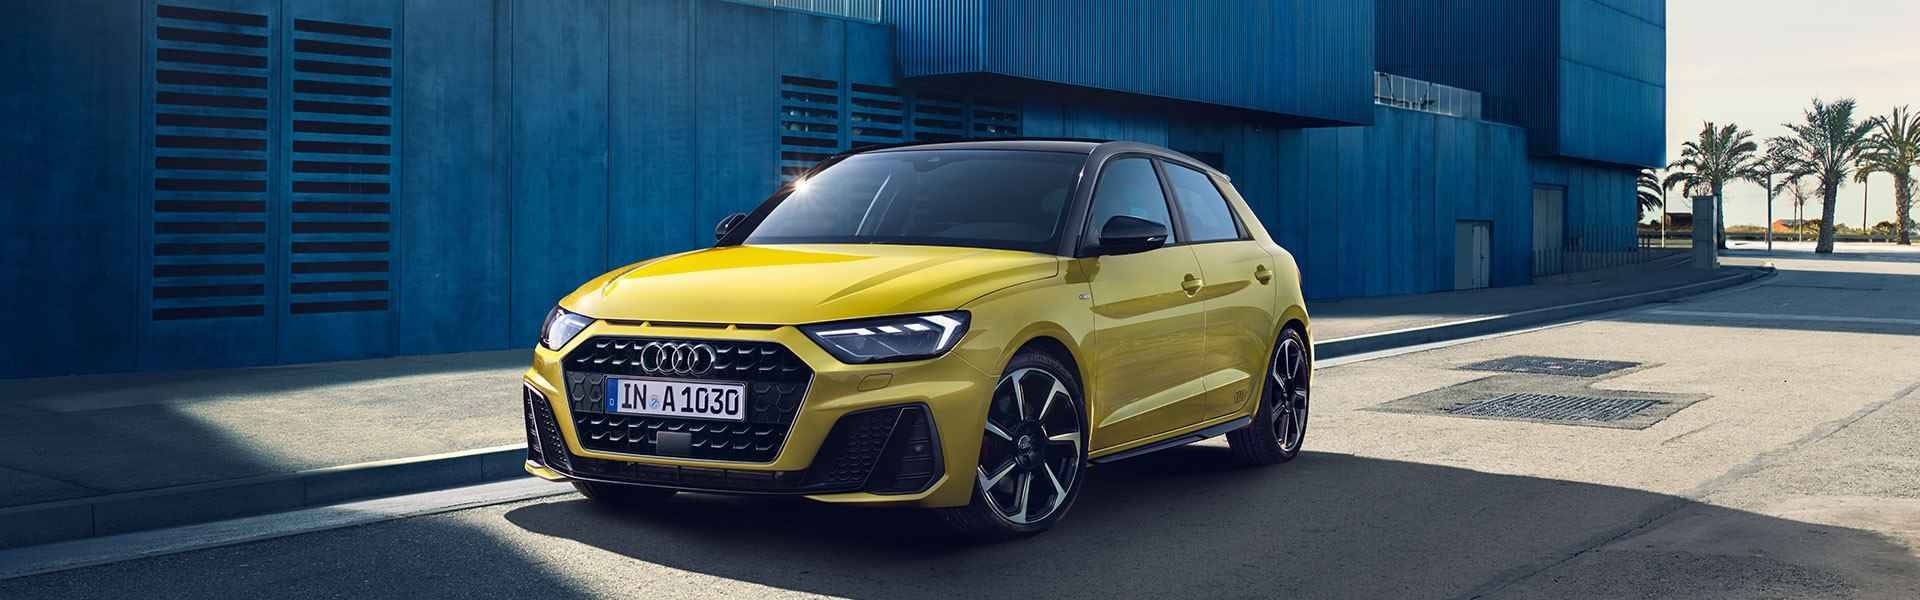 Nouvelle Audi A1 Sportback 2018 header